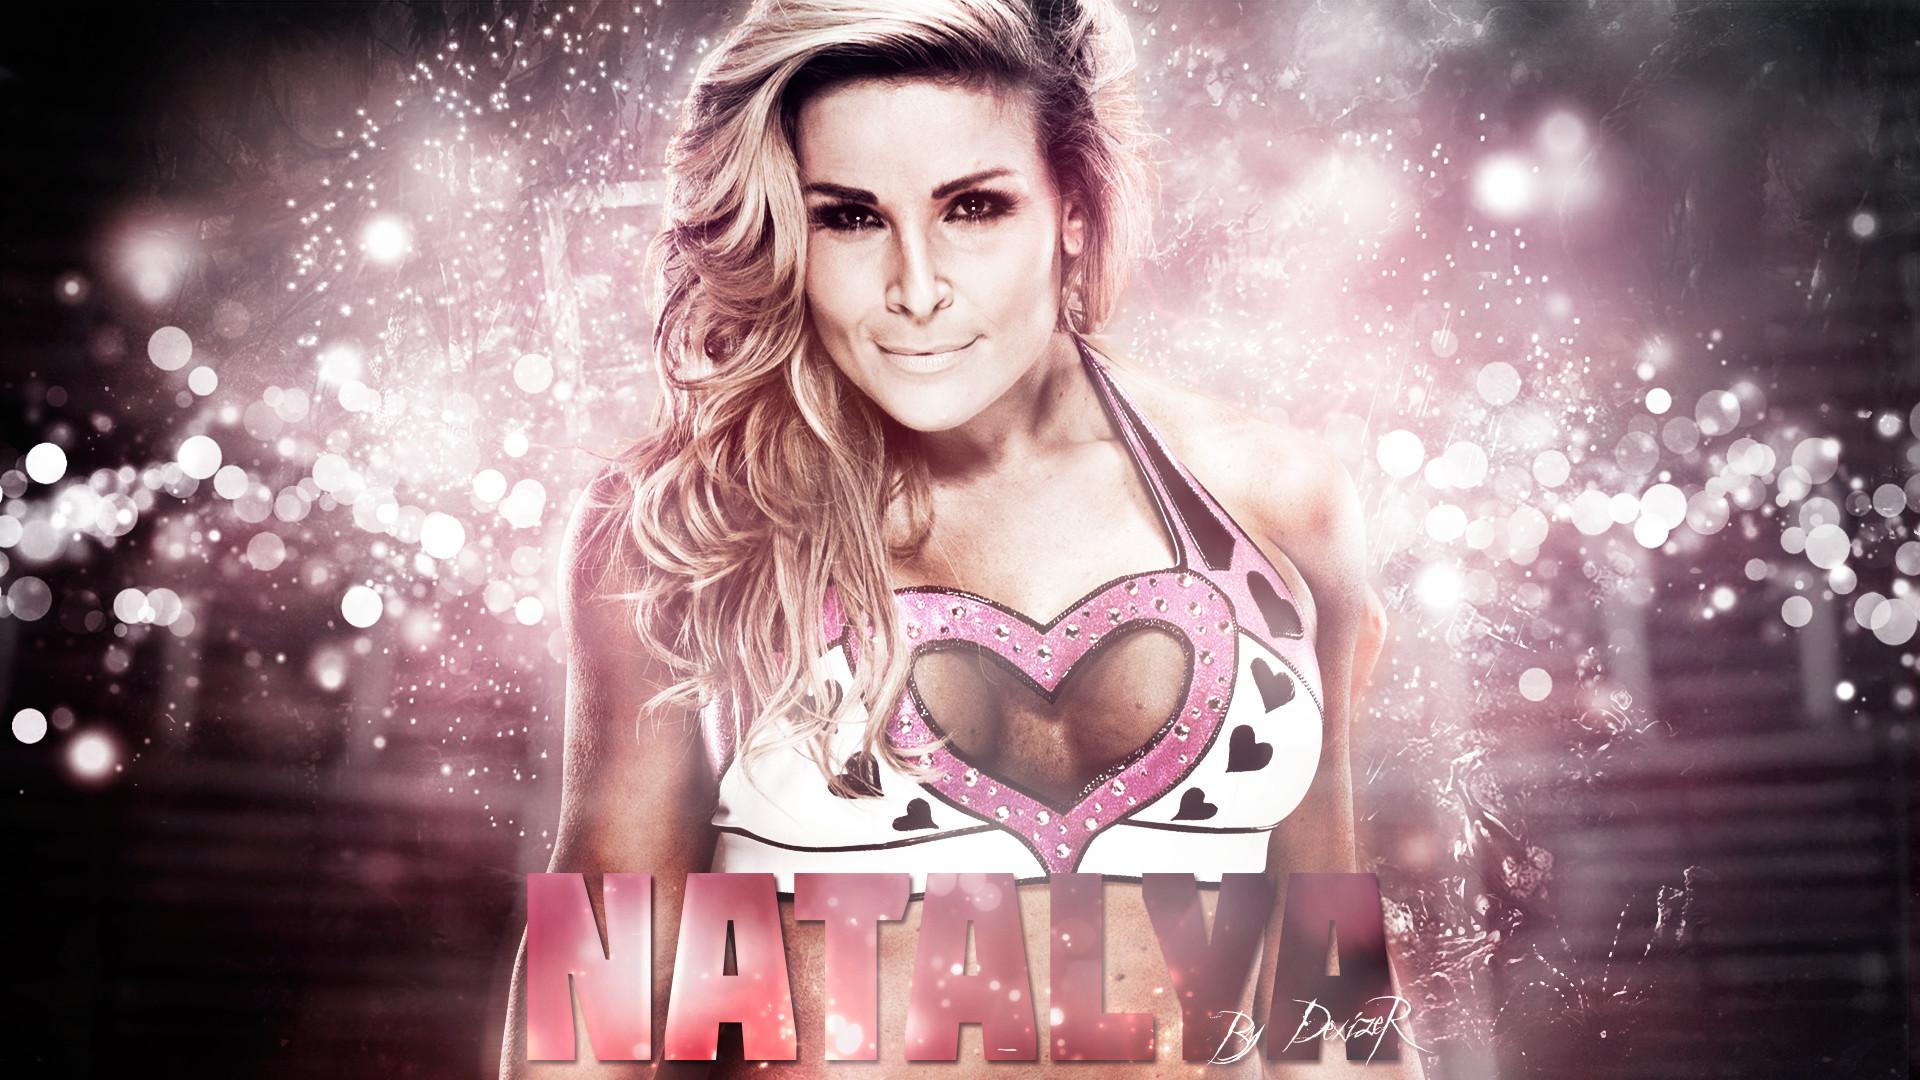 Res: 1920x1080, WWE Natalya HD Wallpaper 2015 by SmileDexizeR on DeviantArt